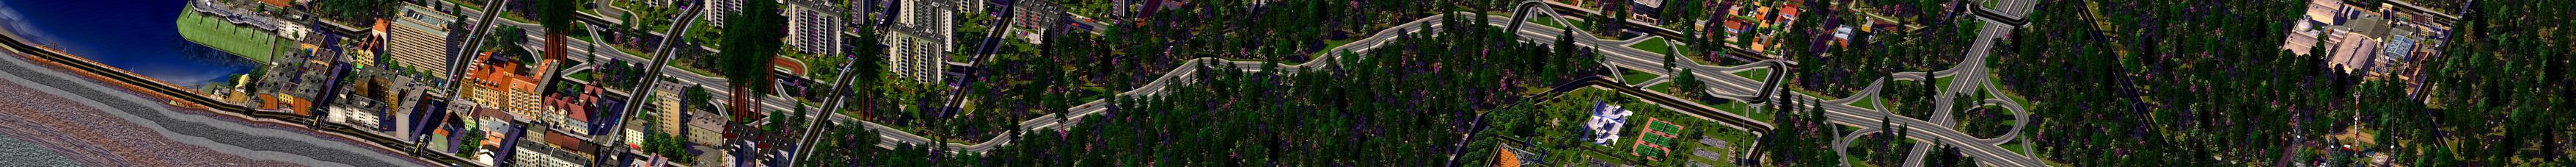 infinitystadt_highwaymosaic_by_alejandro24-d3gd1i5.jpg